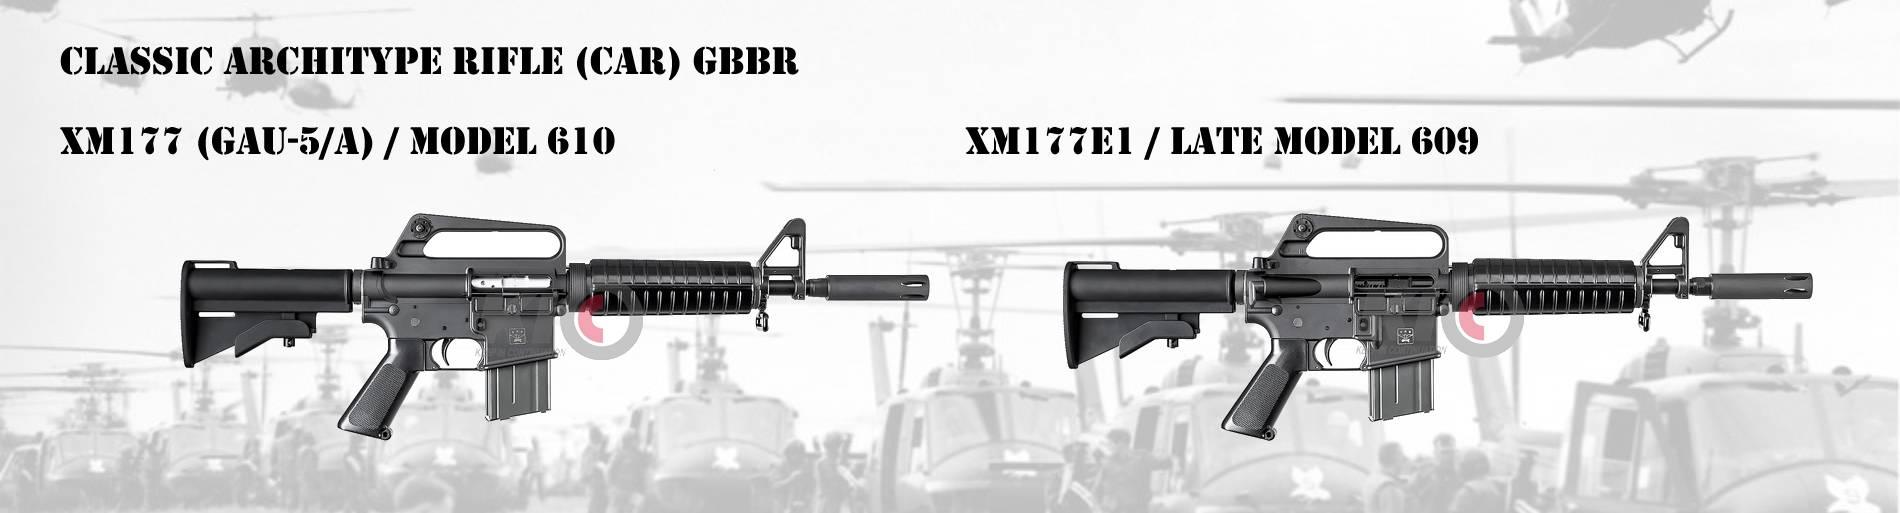 Classic Archetype Rifle XM177 & XM177E1 GBBR